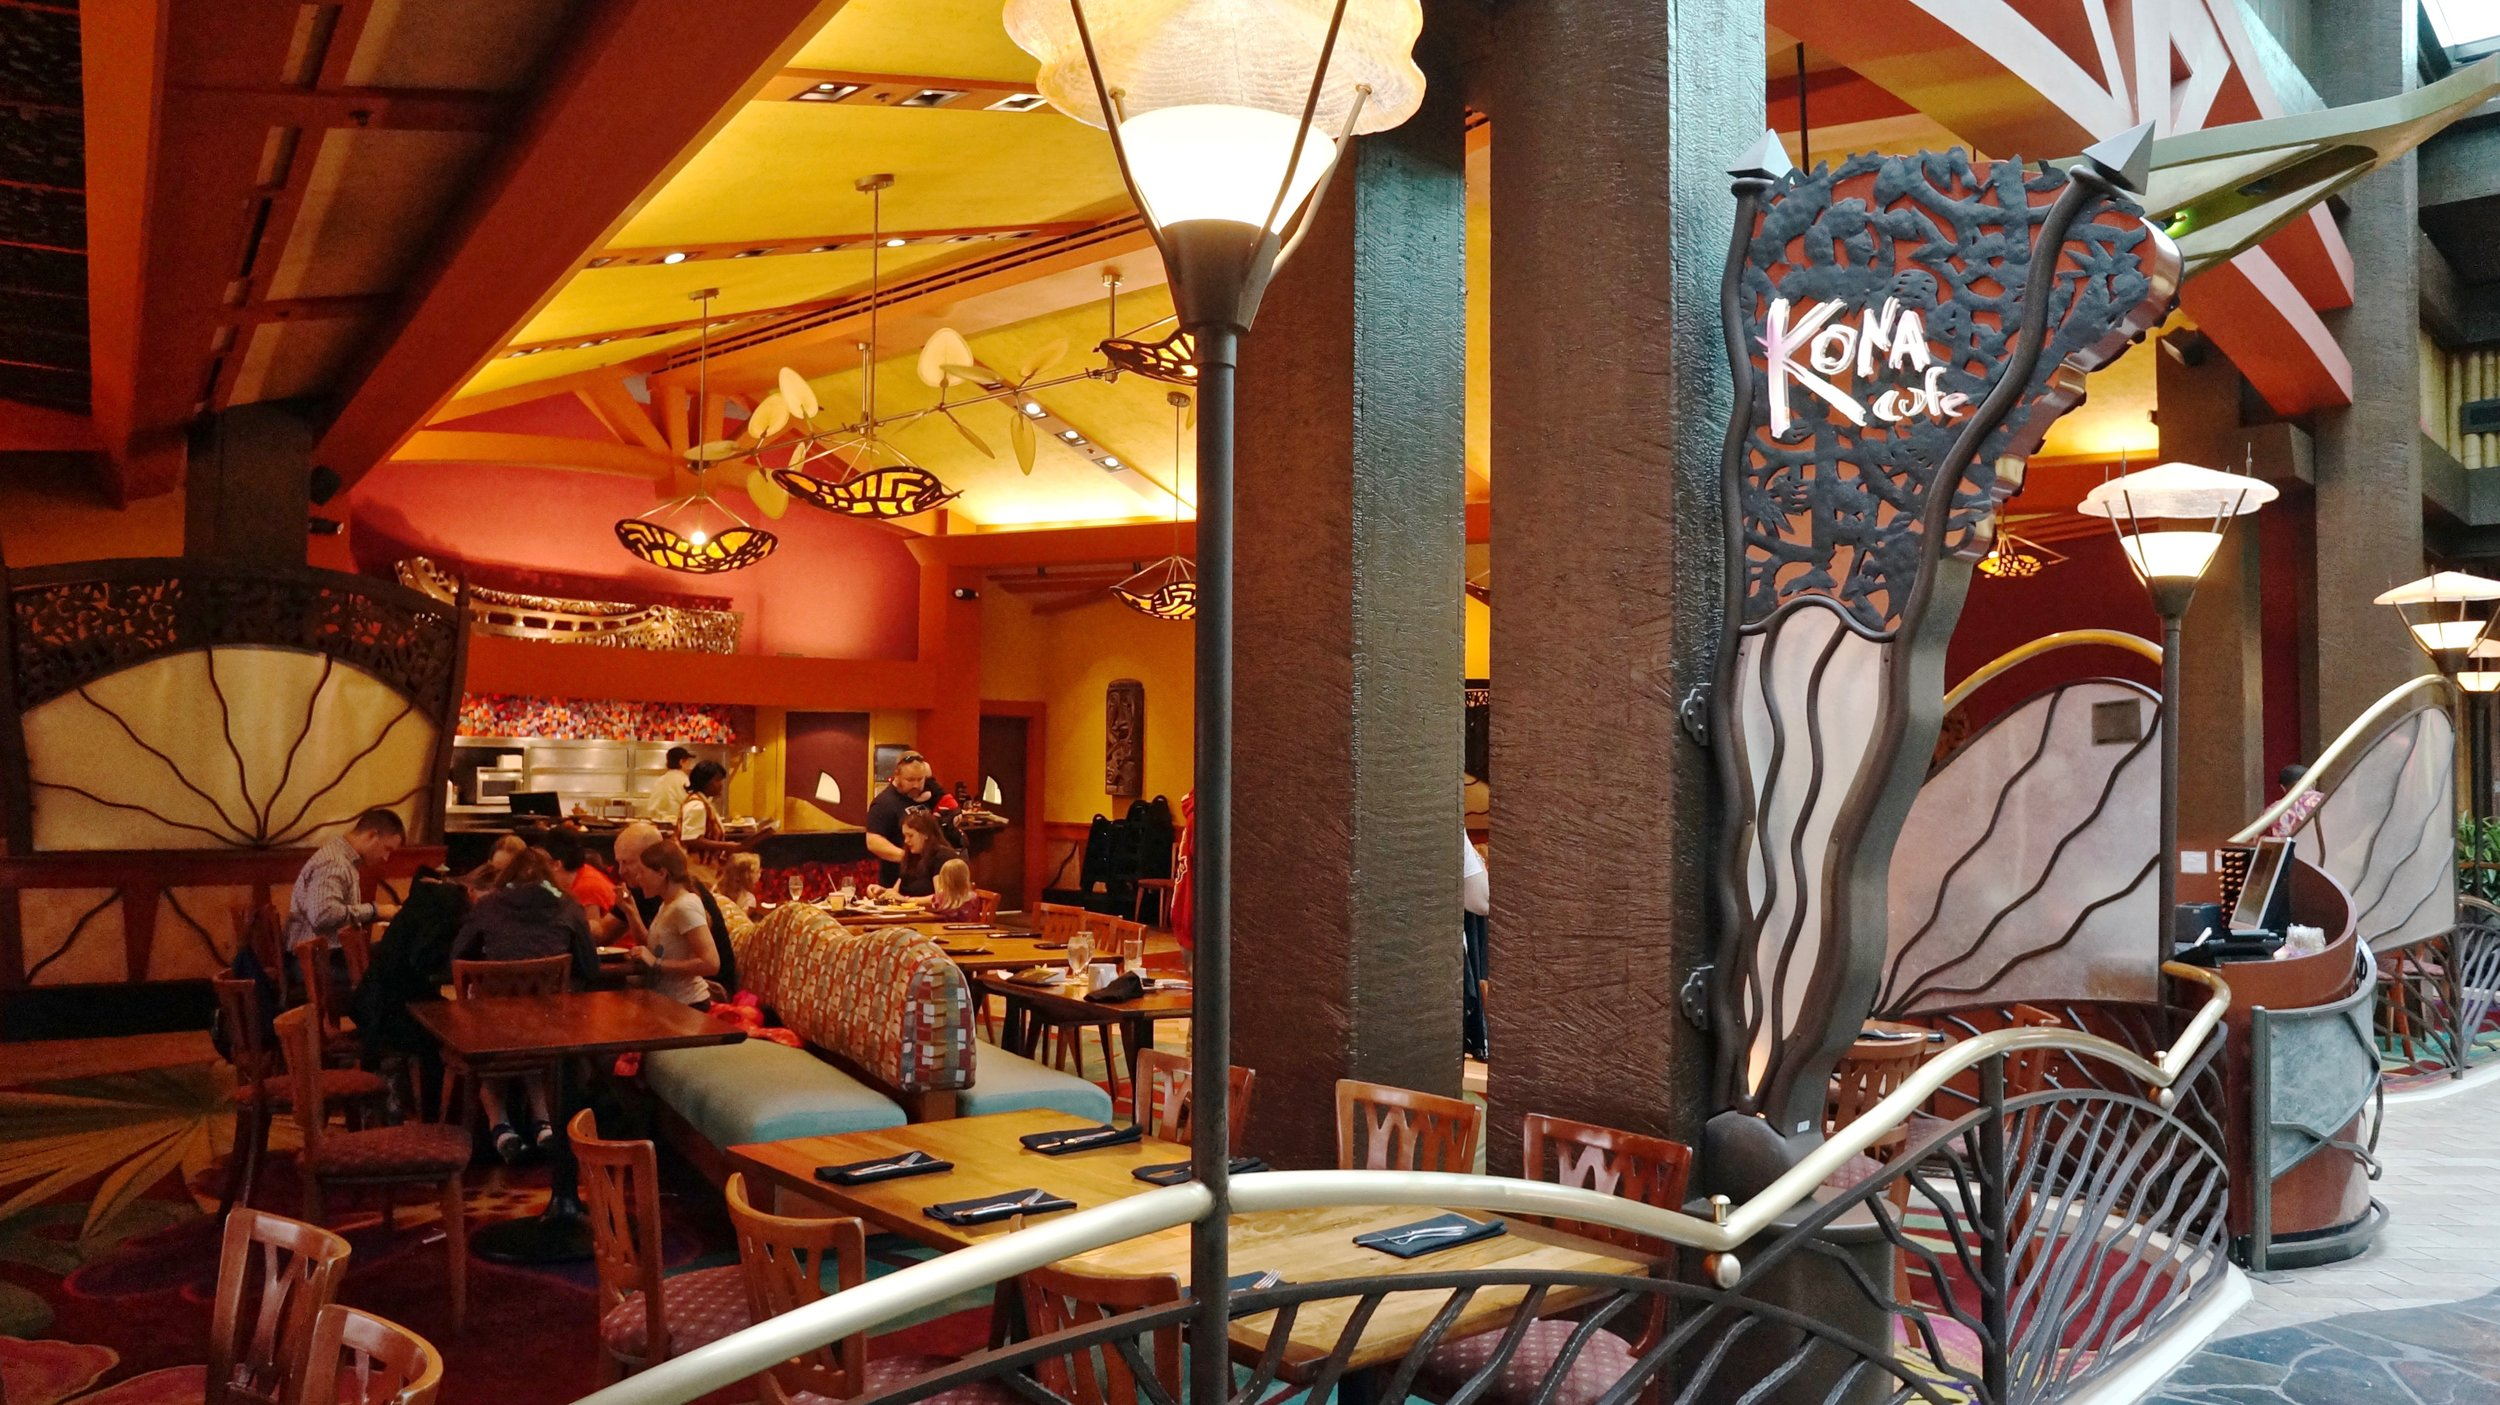 kona-cafe-polynesian.jpg